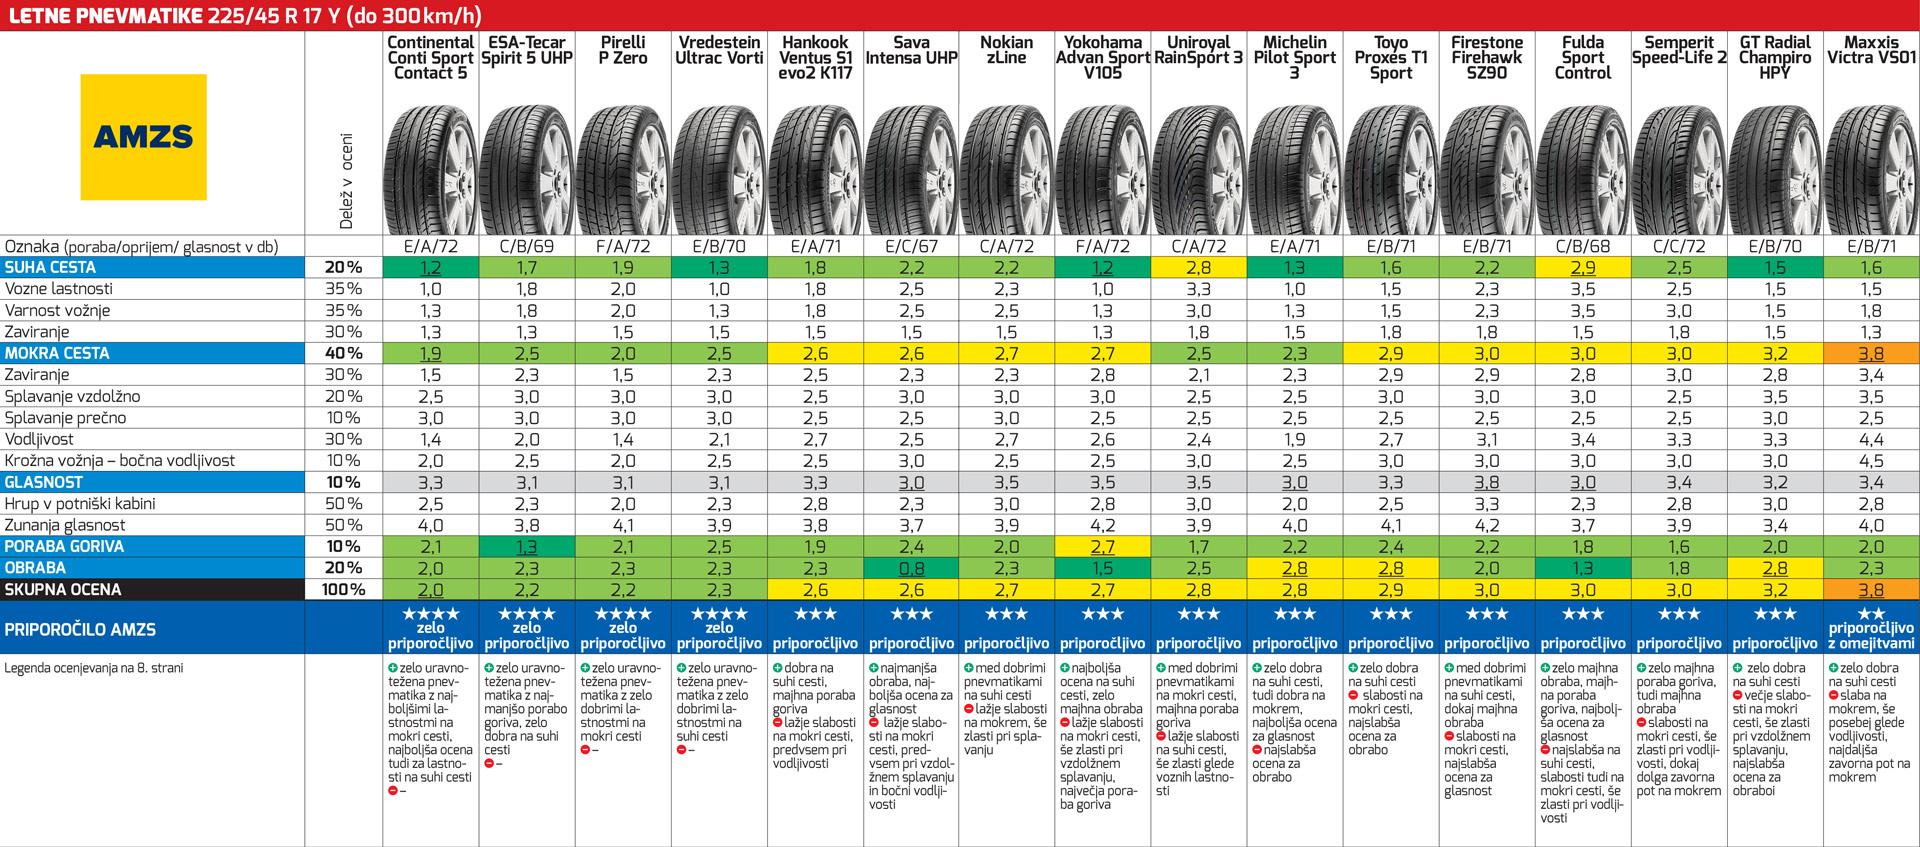 Blog - Letne pnevmatike 10